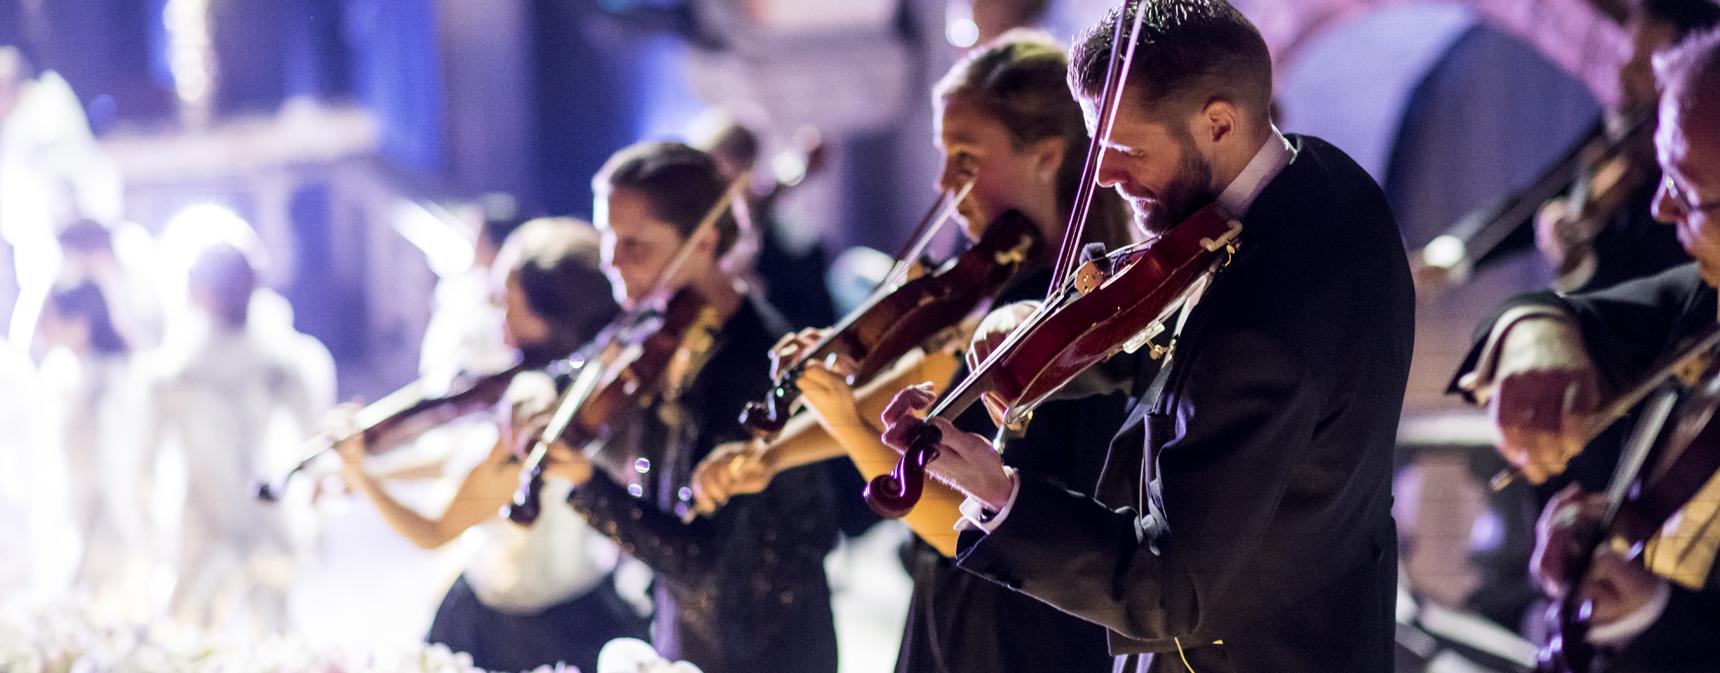 Stråkmusiker i Musica Vitae uppträder på Nobelgalan 2018